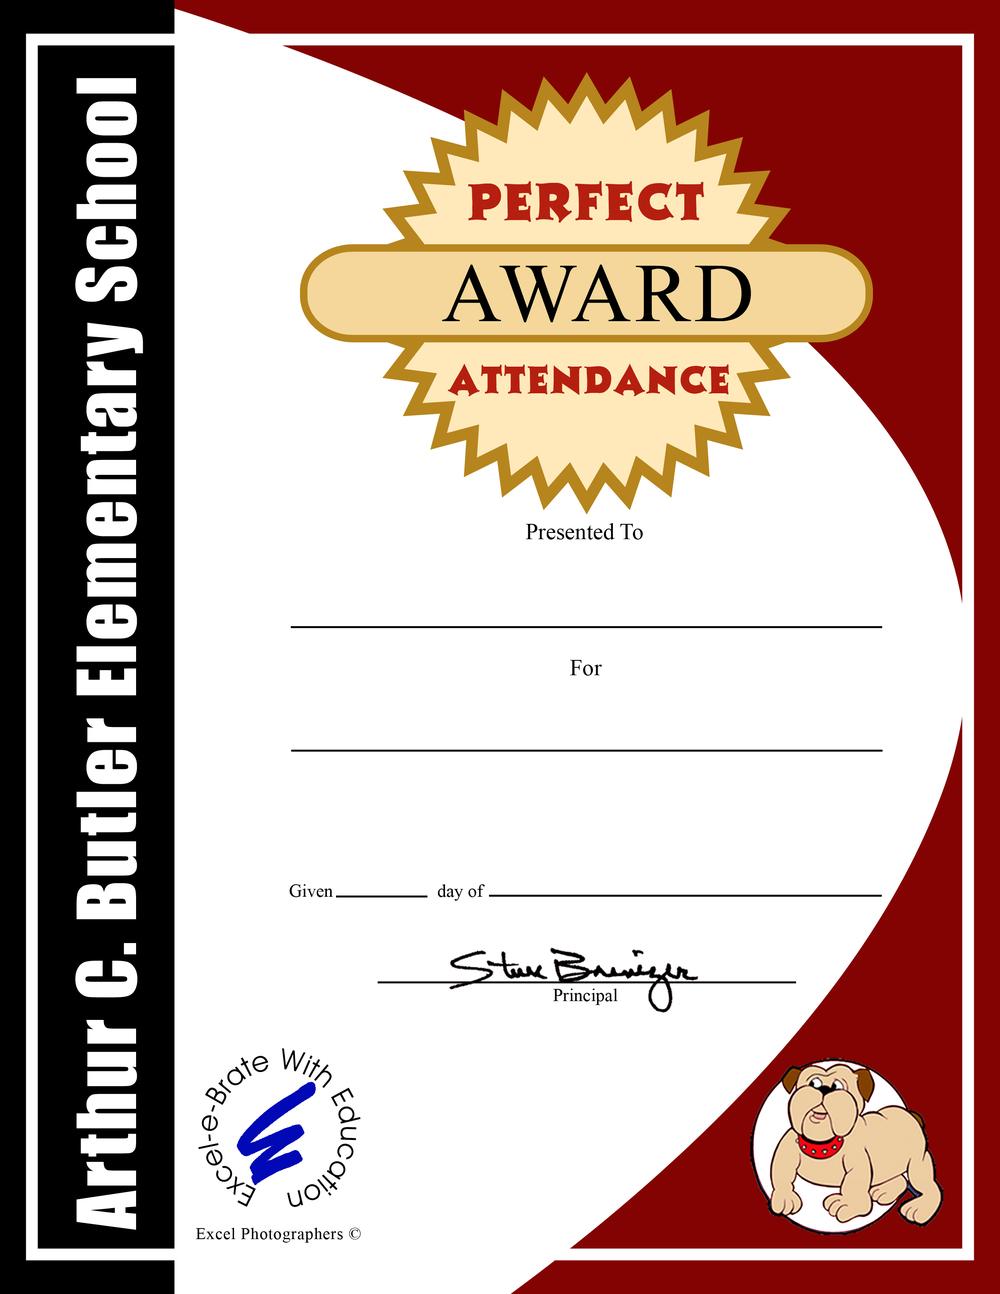 Award Item: PA-4